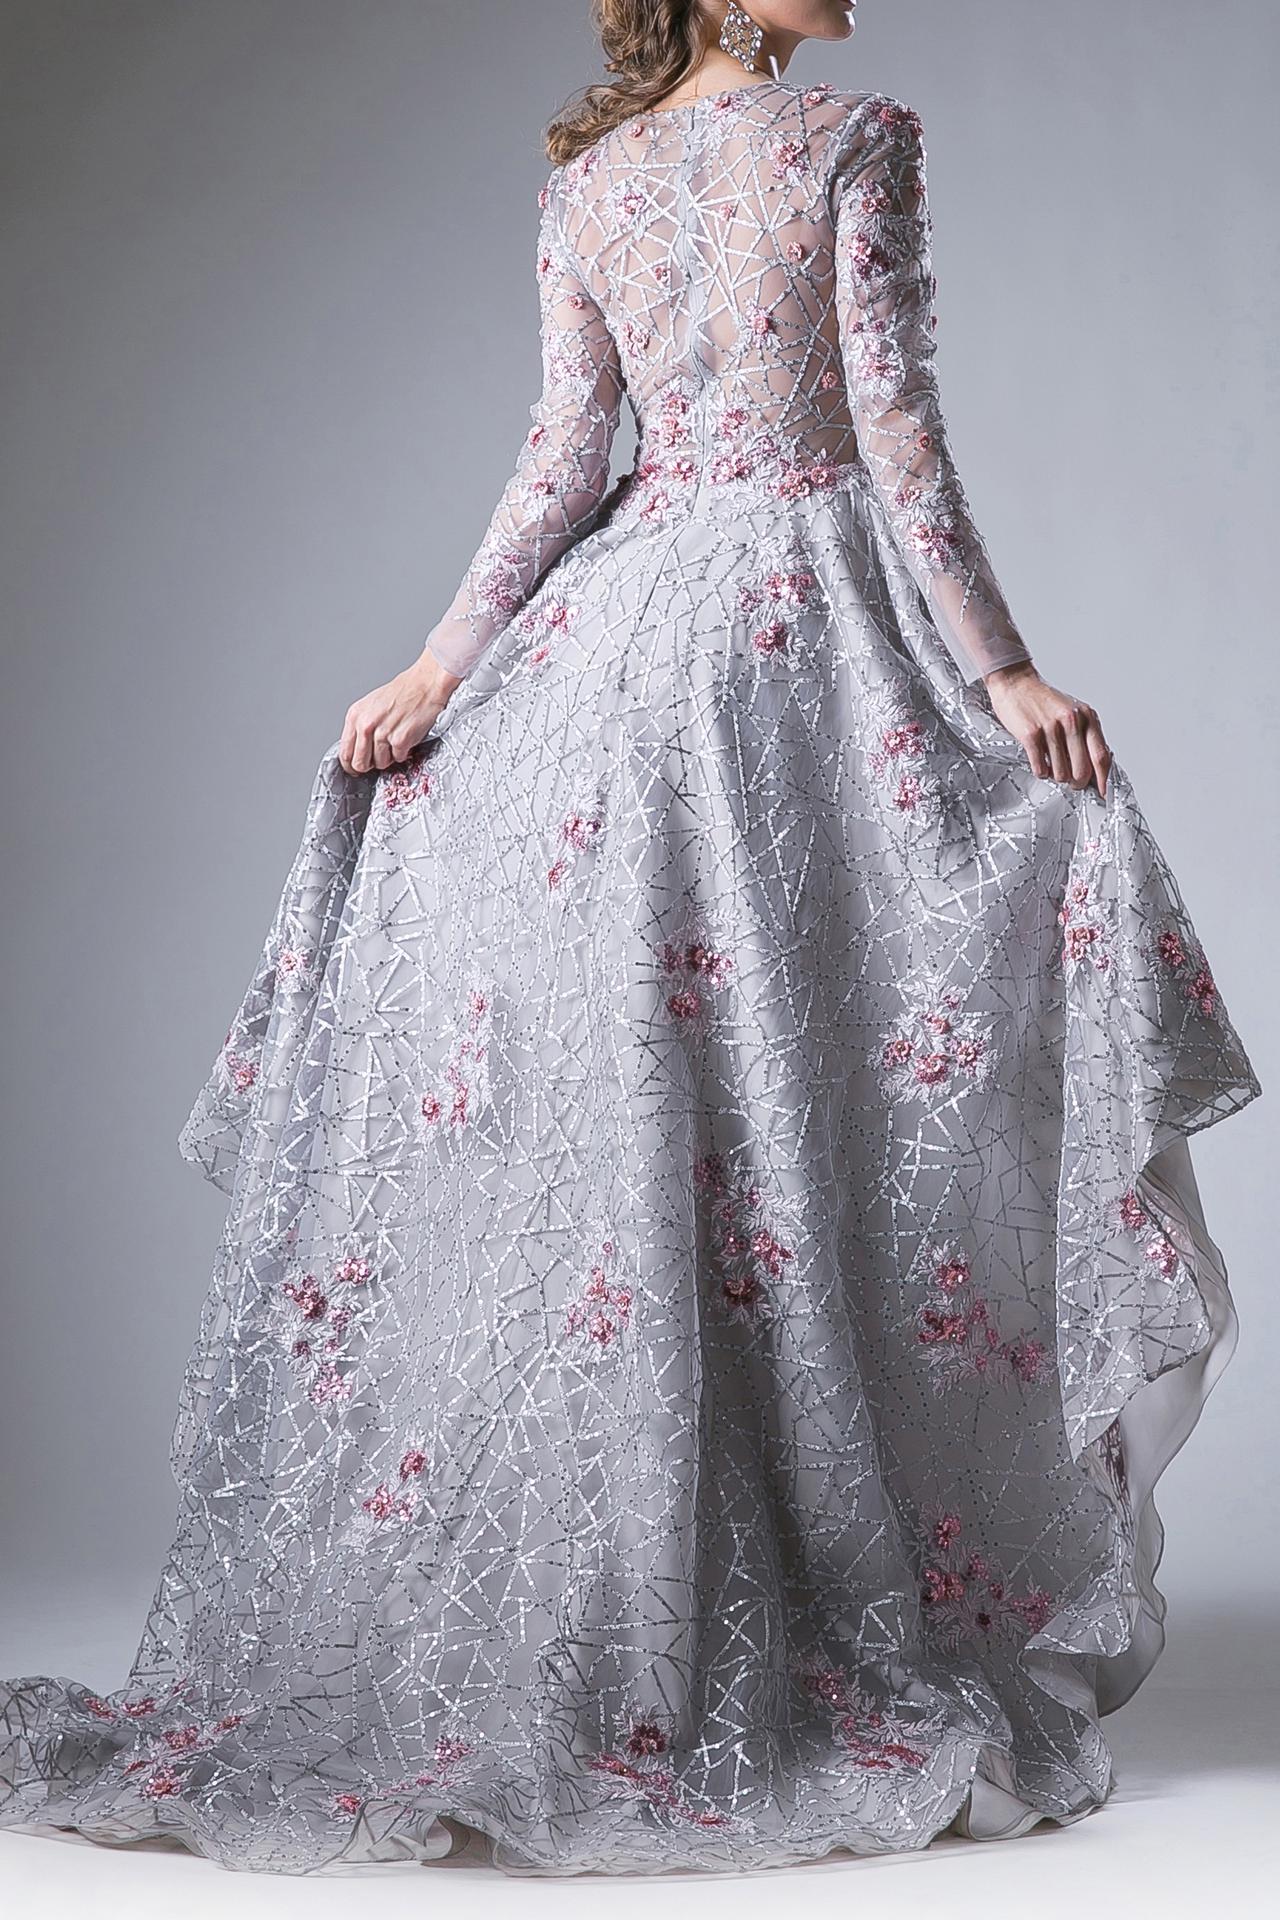 Nové spoločenské šaty :) - Obrázok č. 2